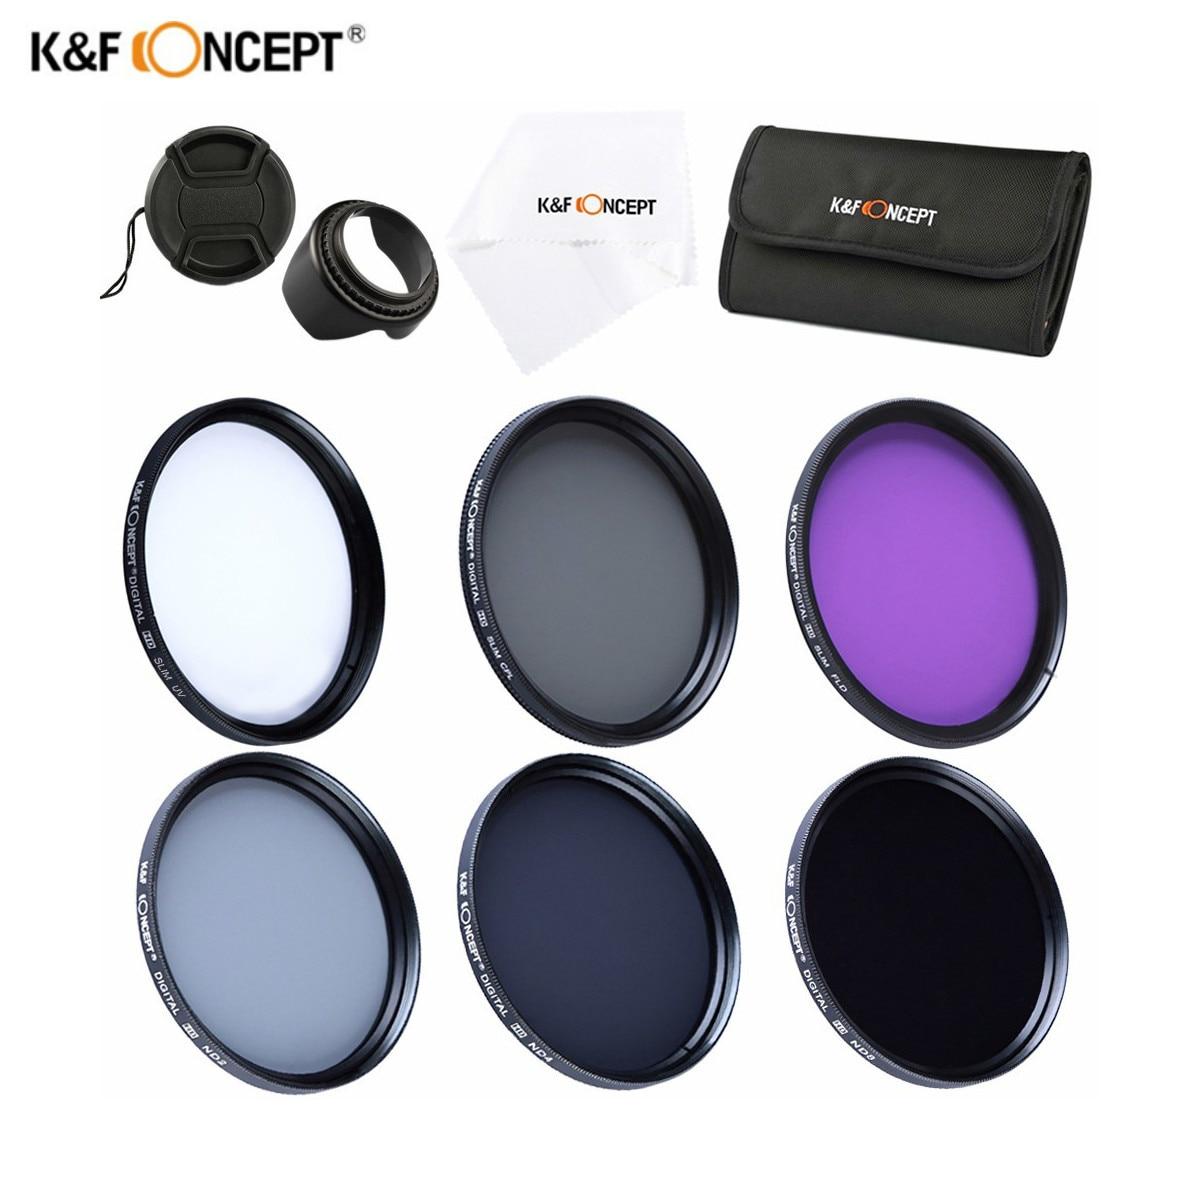 10pcs//lot 25mm 27mm 30mm 30.5mm 39mm Lens UV Digital Filter Lens Protector for Canon for Nikon Sony DSLR SLR Camera 30.5mm ND UV CPL Filter